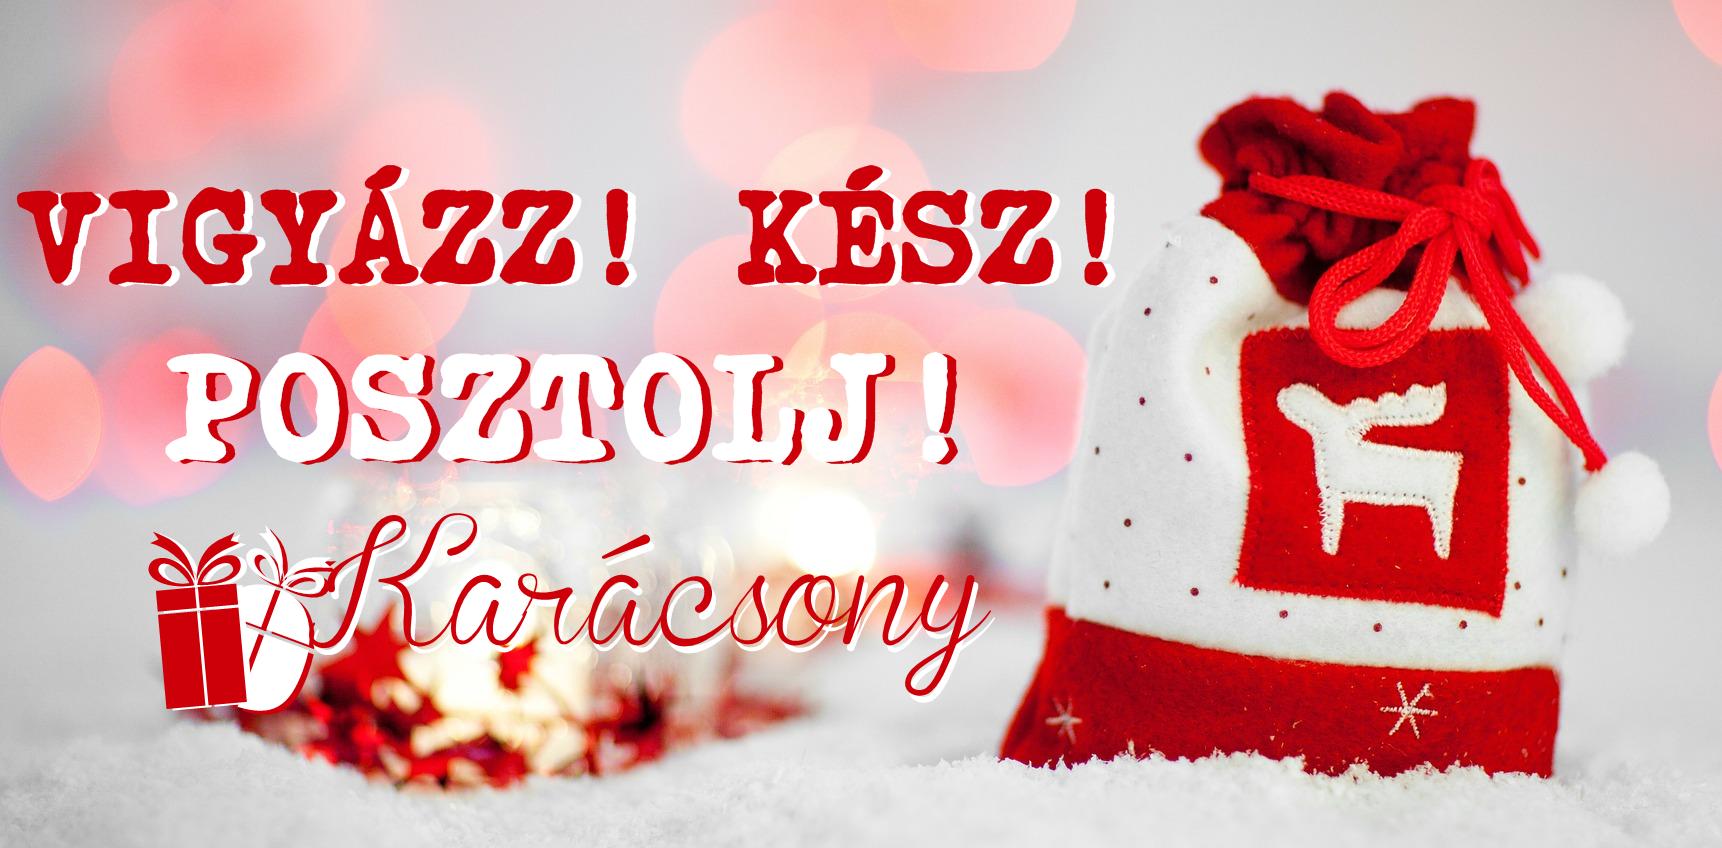 vkp_karacsony_hivatalos_kep.png